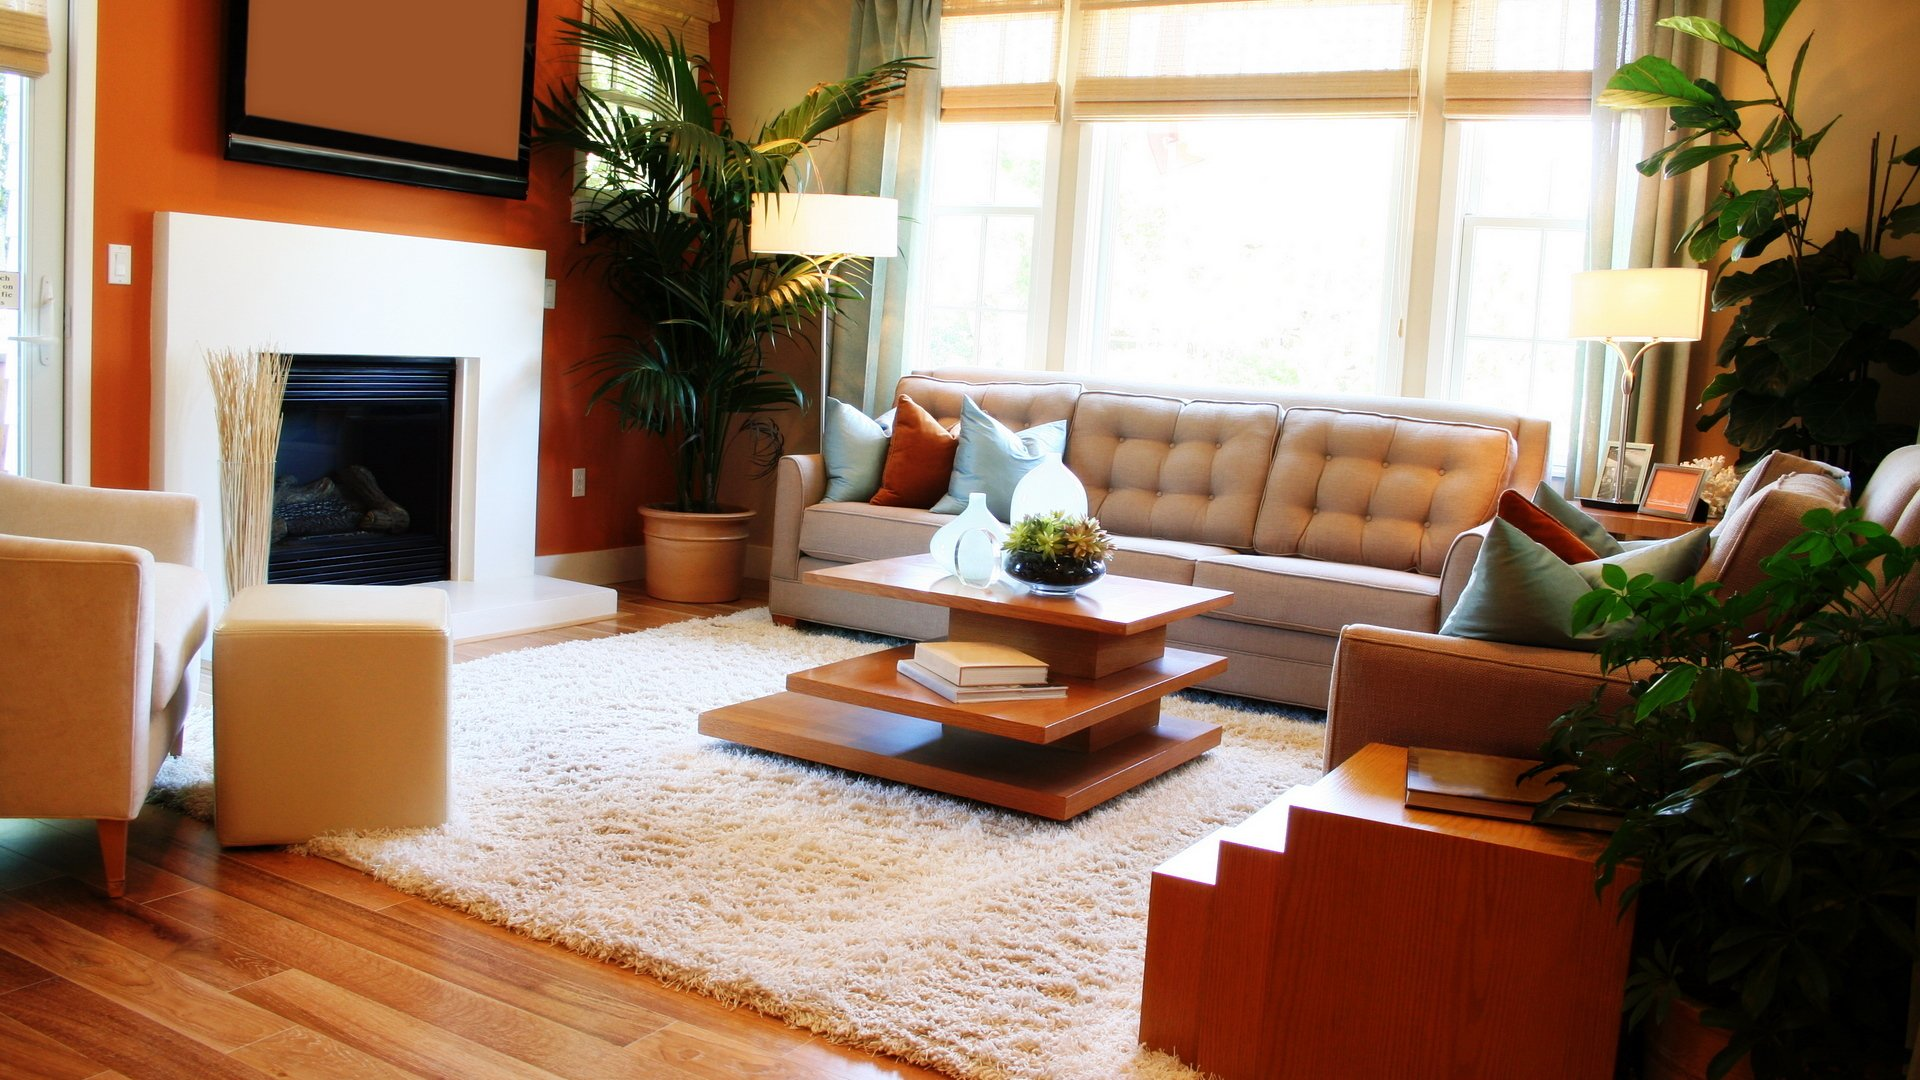 интерьер камин комната диван interior fireplace bathroom sofa онлайн